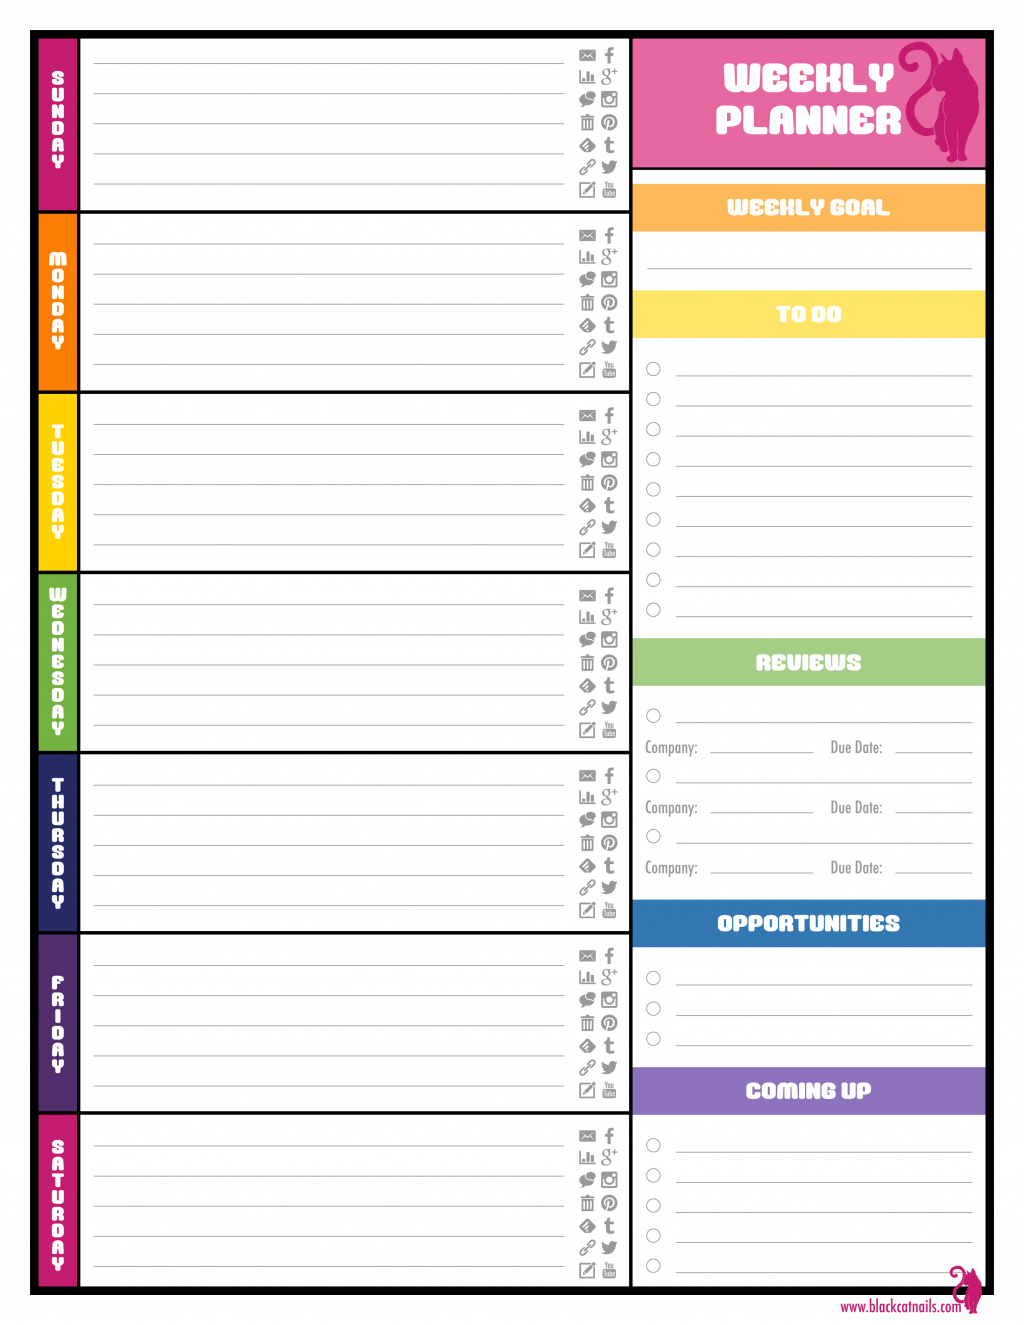 Blank Weekly Nner Pdf Student Template Free Printable Meal | Smorad - Student Planner Template Free Printable